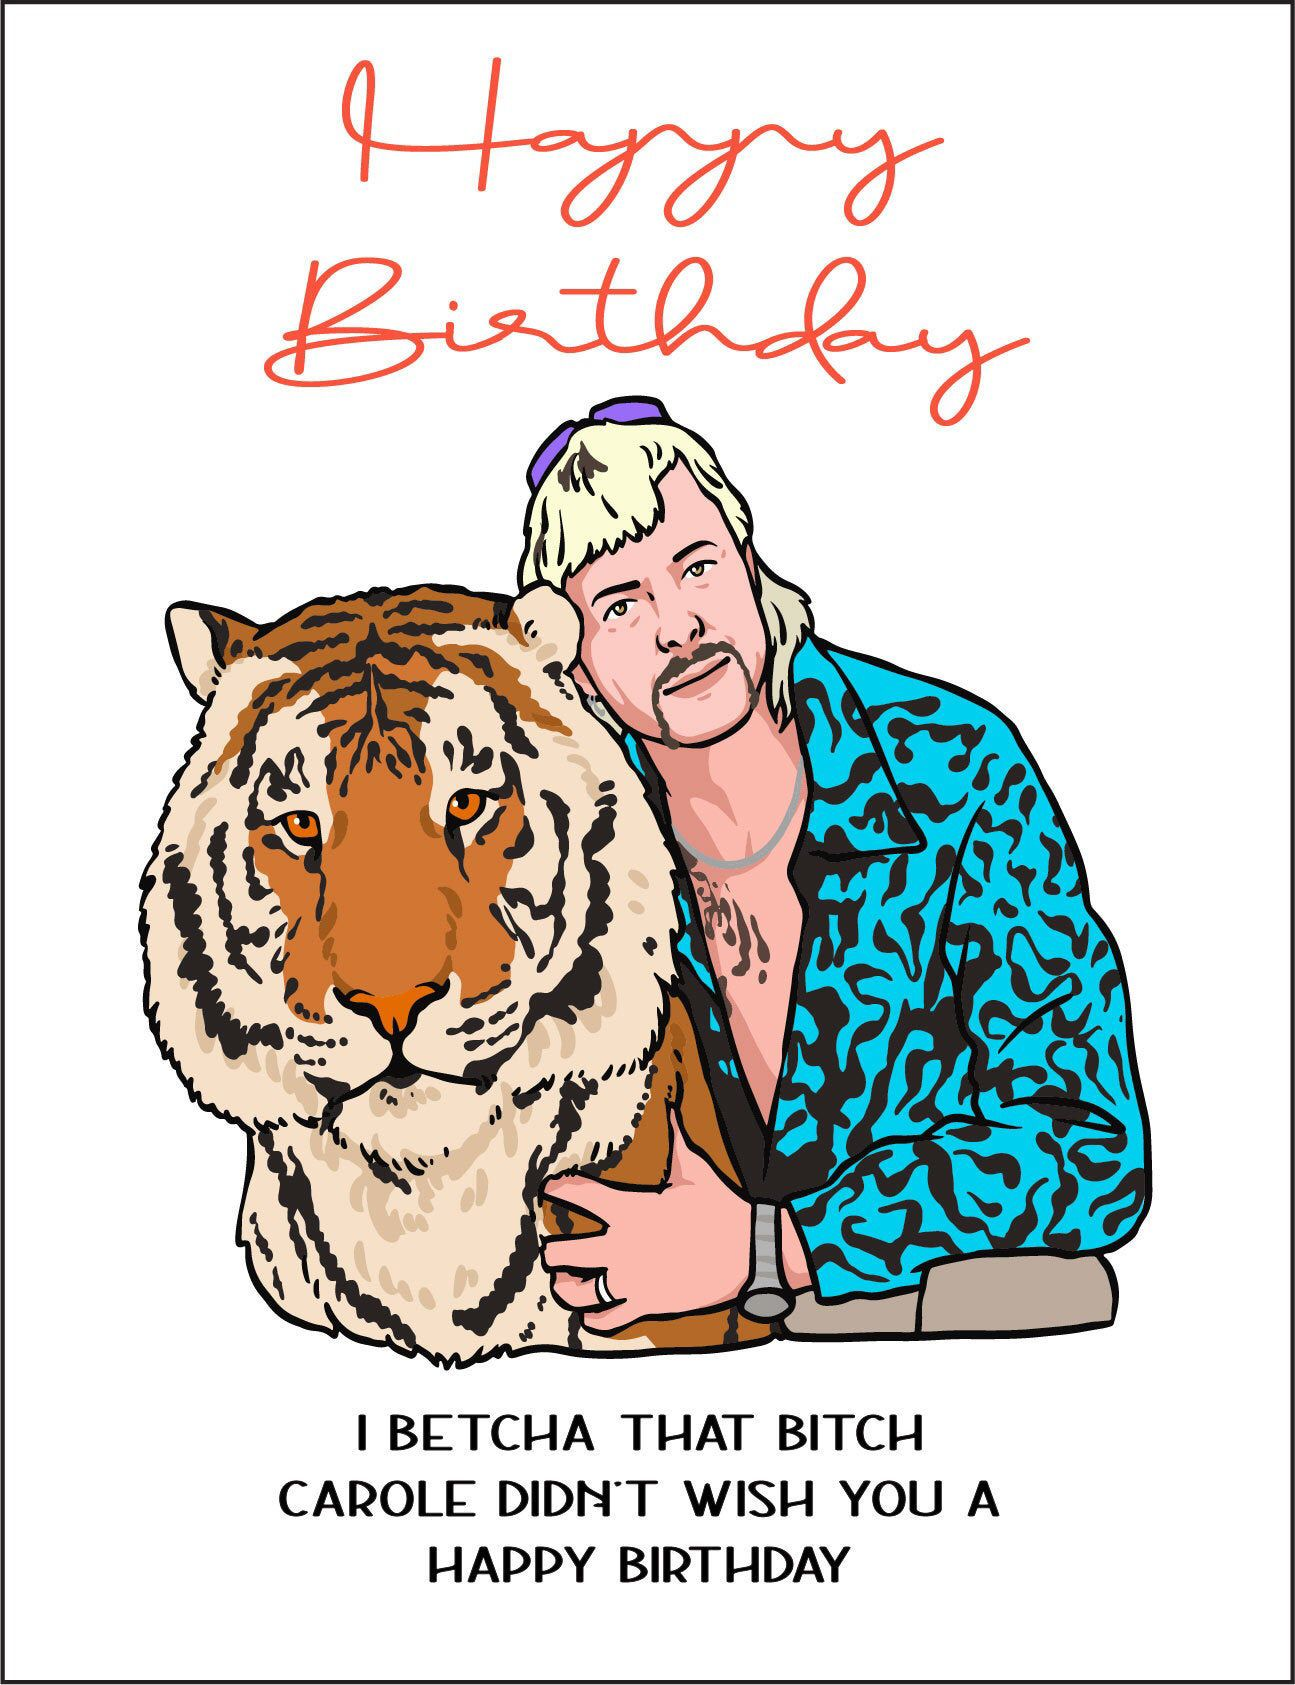 The Tiger King Funny Birthday Card | Happy Birthday From Joe Exotic | Carole Baskin | Tiger King Netflix | Joe Exotic Birthday Card